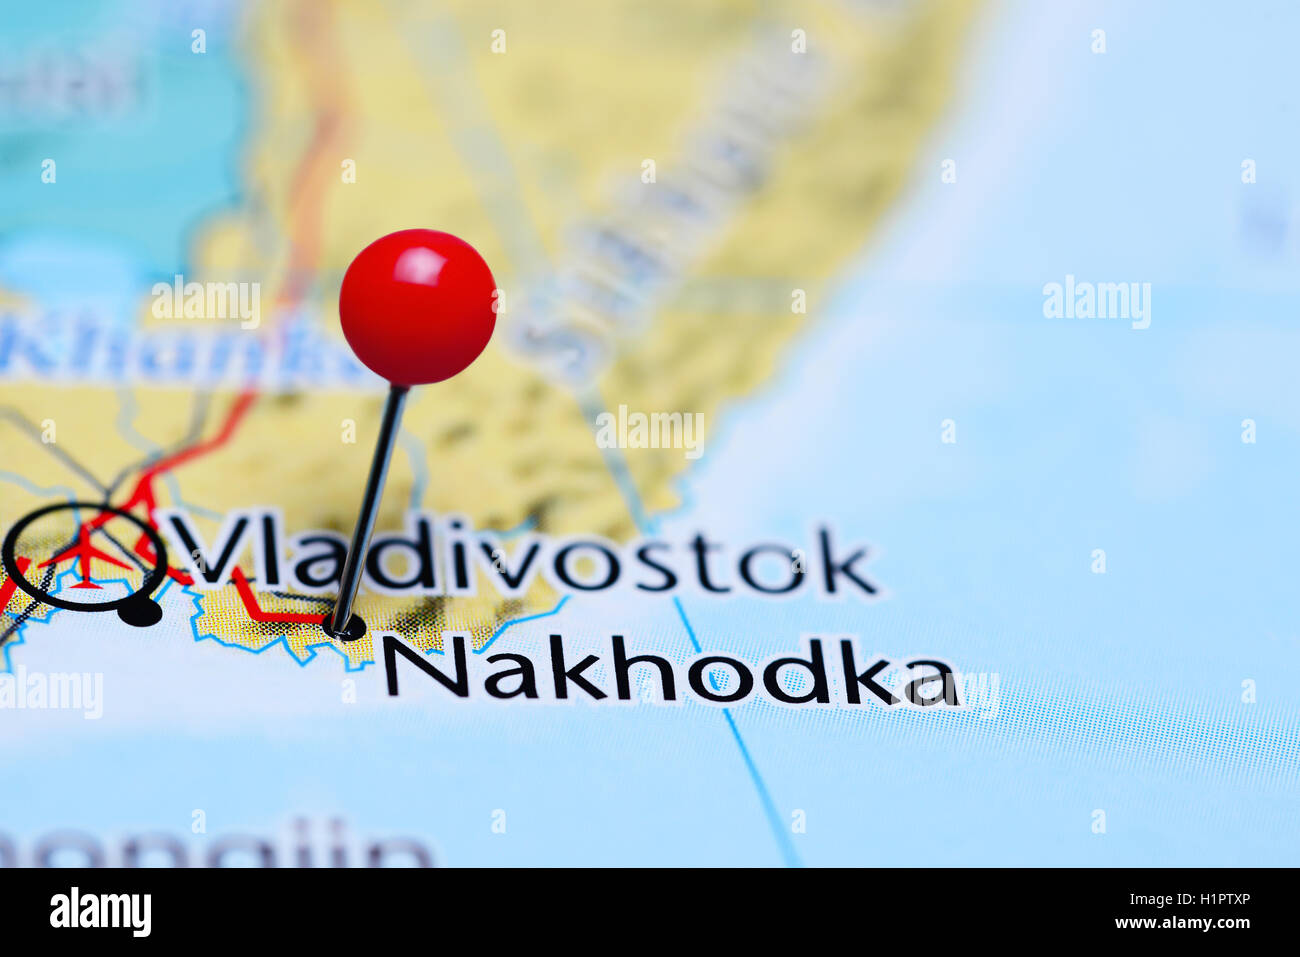 Nakhodka Pinned On A Map Of Russia Stock Photo Royalty Free Image - Nakhodka map